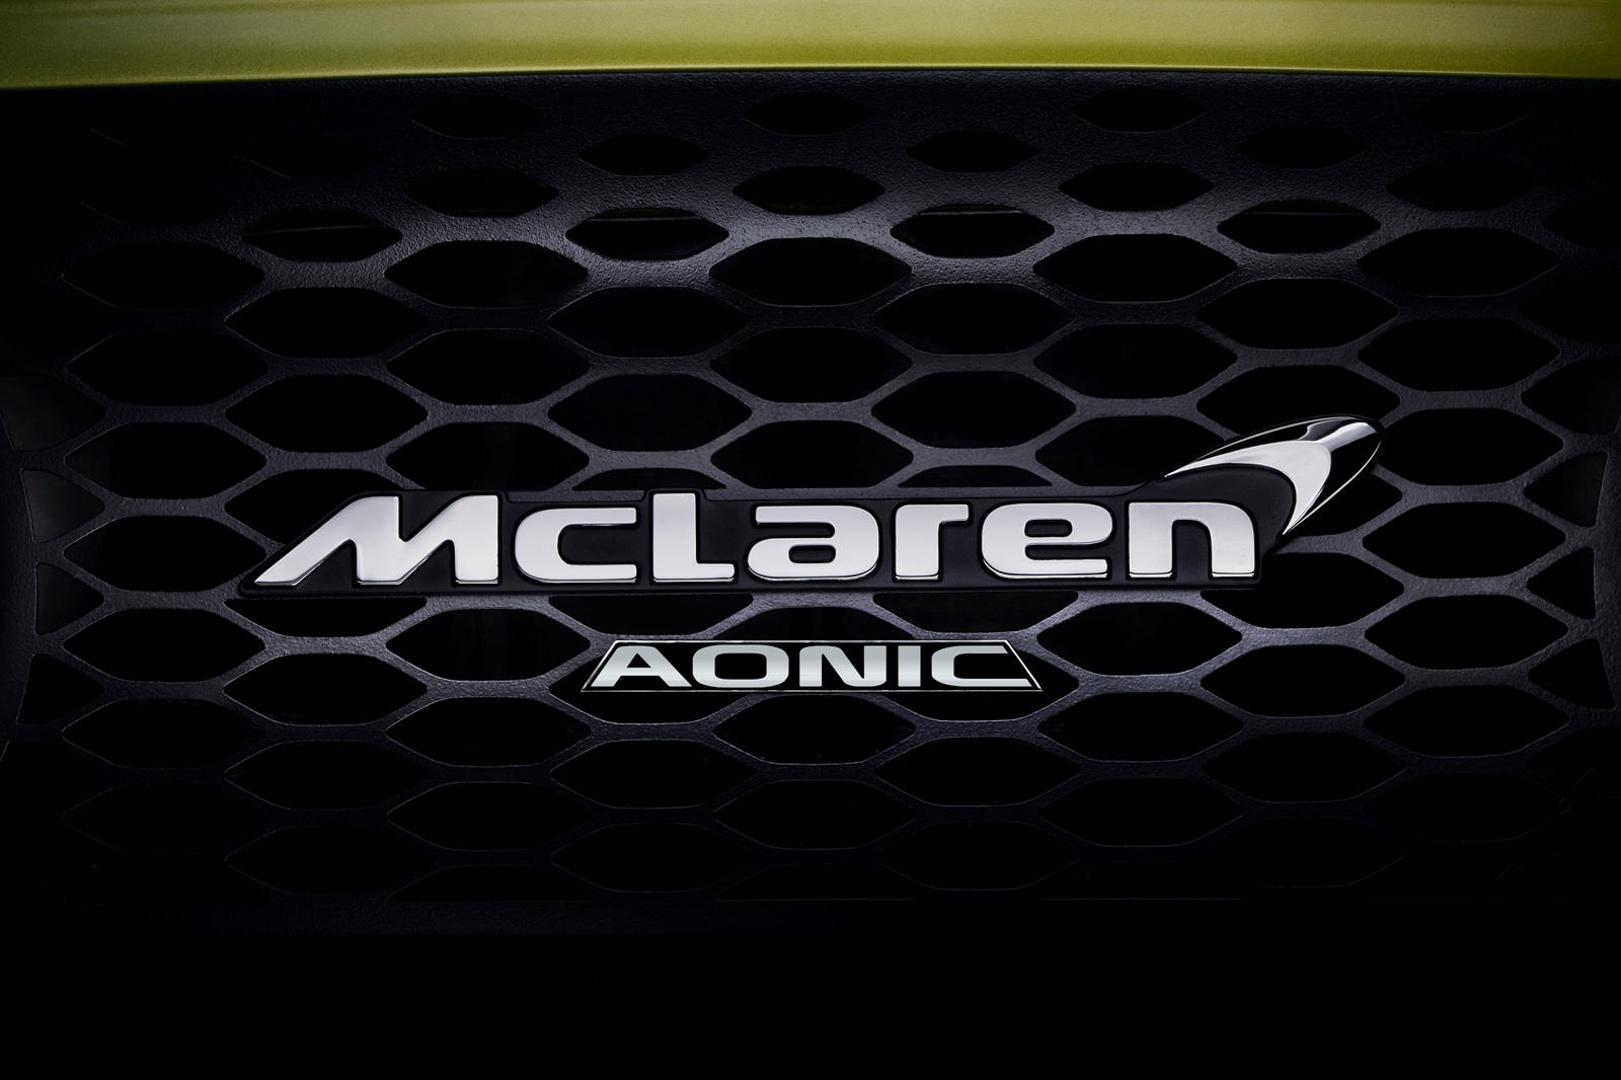 CP-McLaren tiết lộ tên của các mẫu xe mới1.jpg